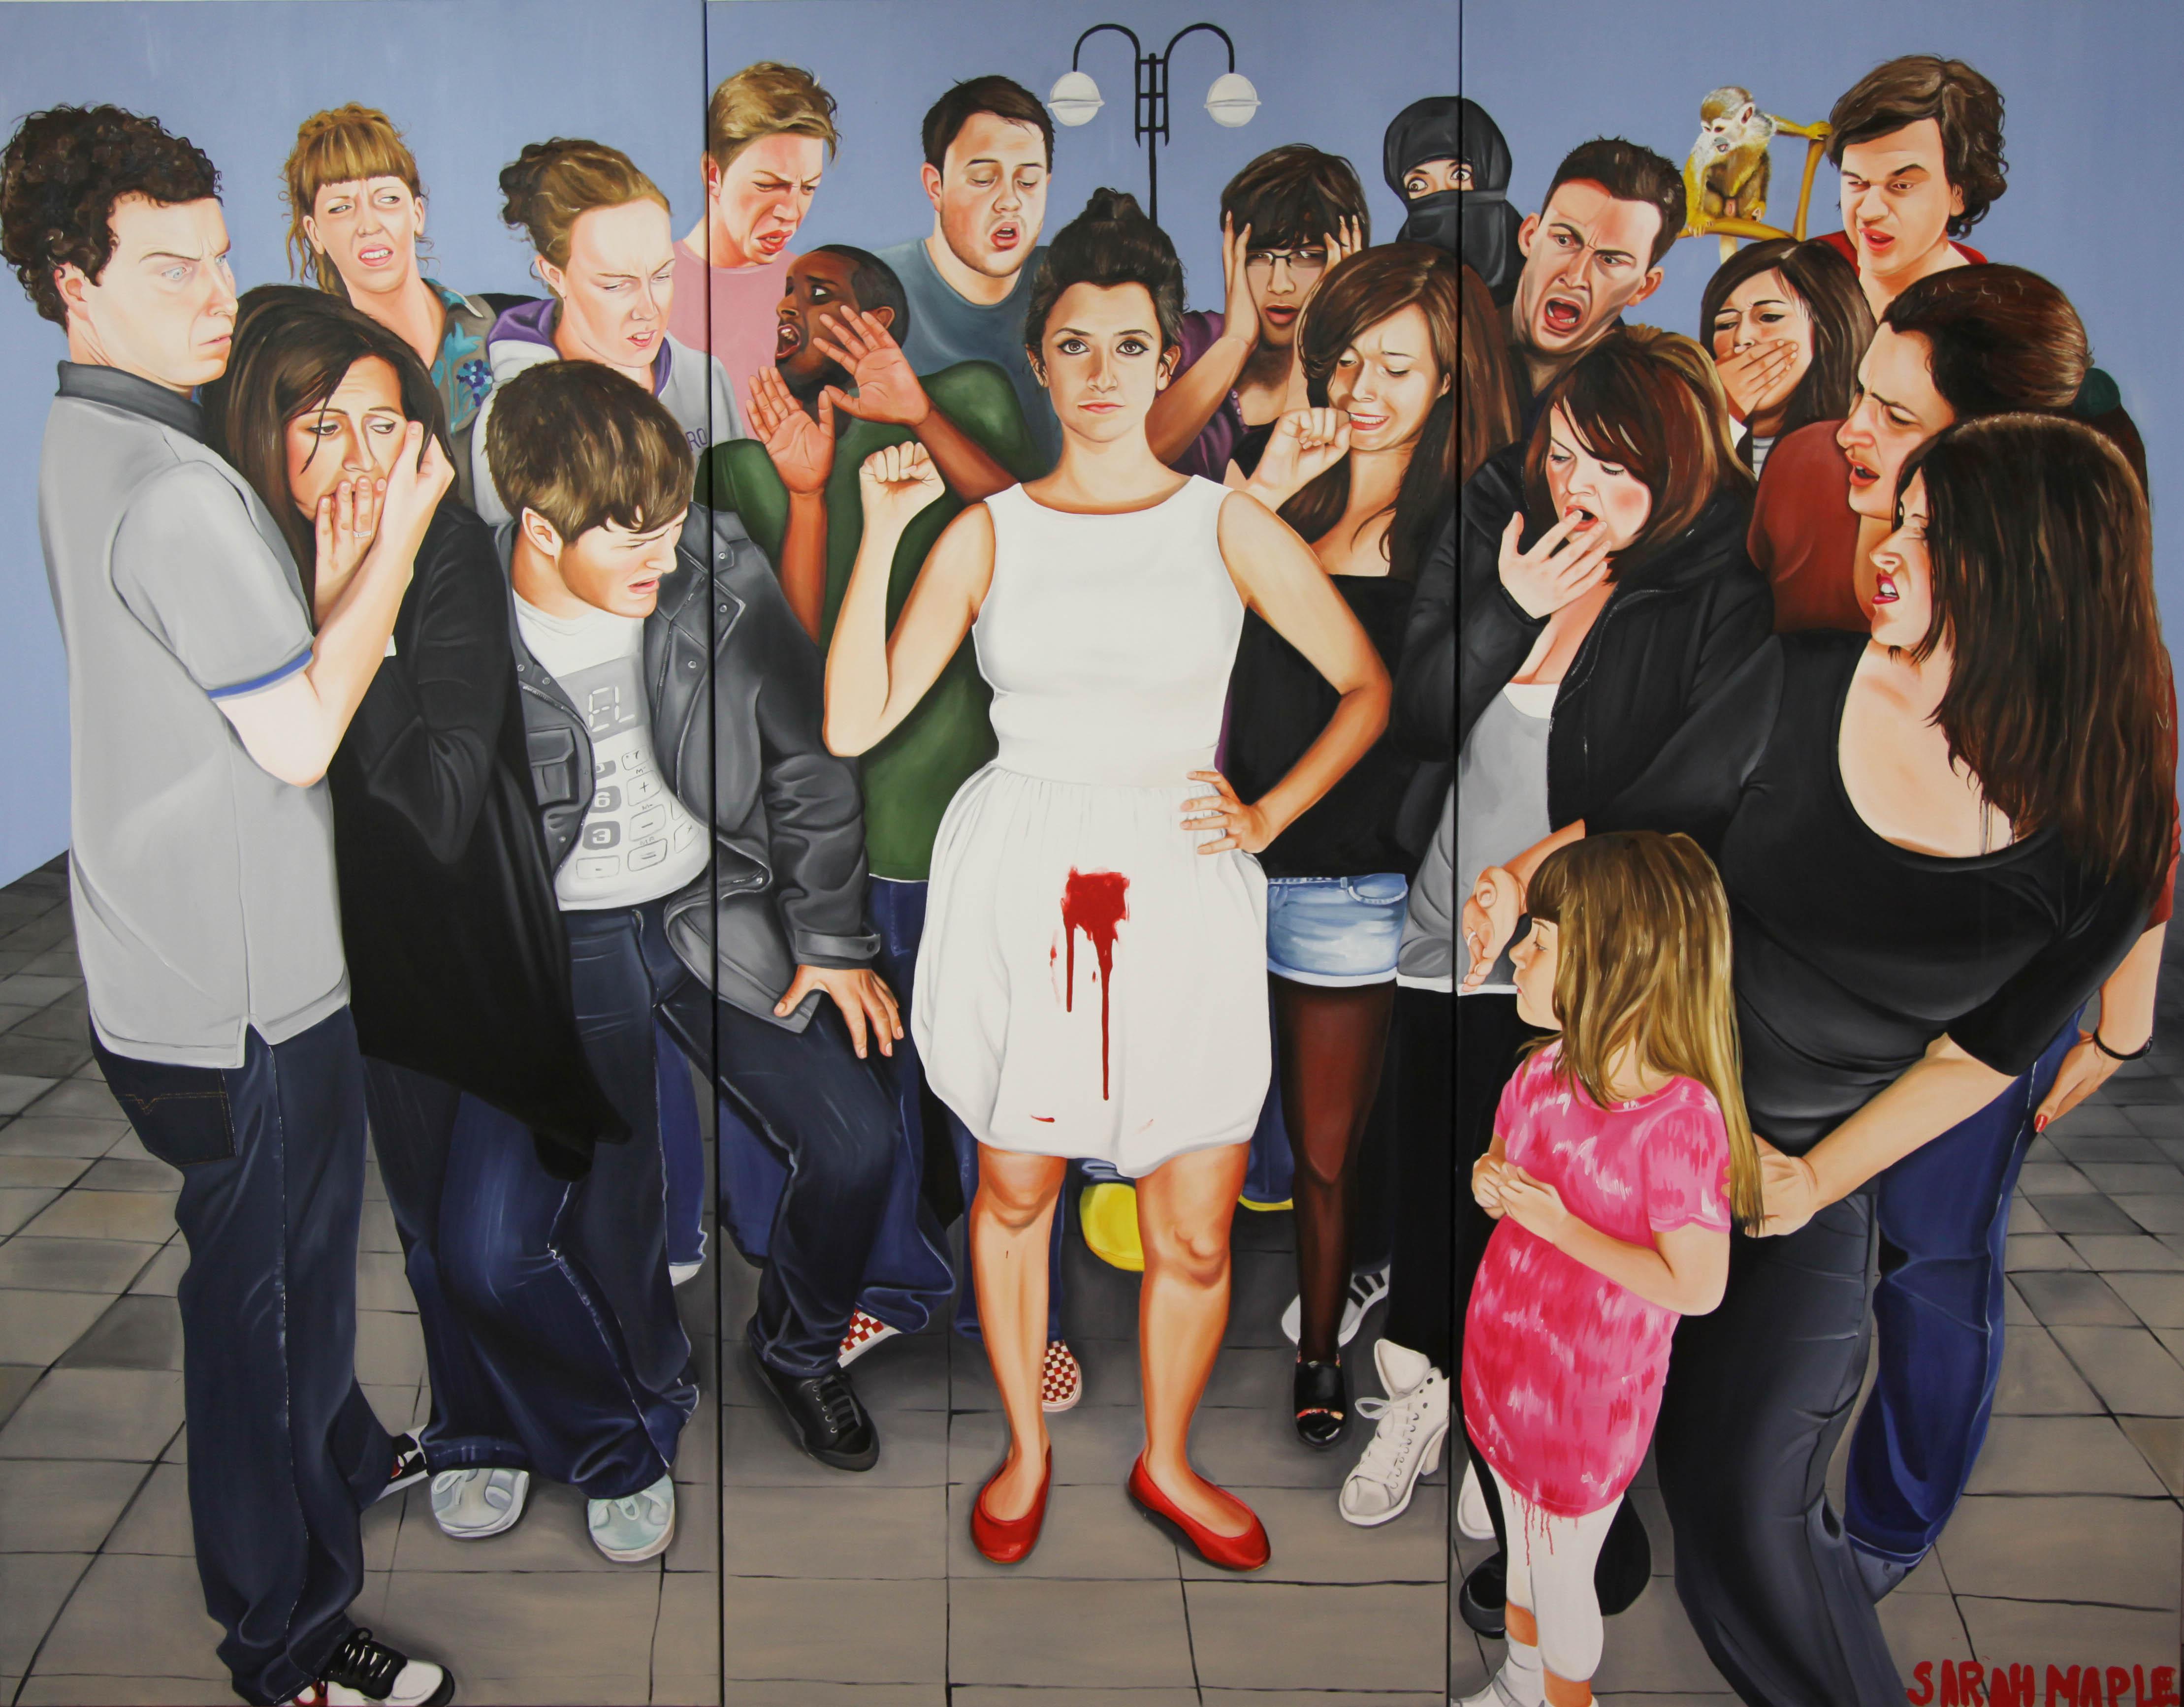 Sarah Maple, Menstruate with Pride, 2010-11. Courtesy the artist